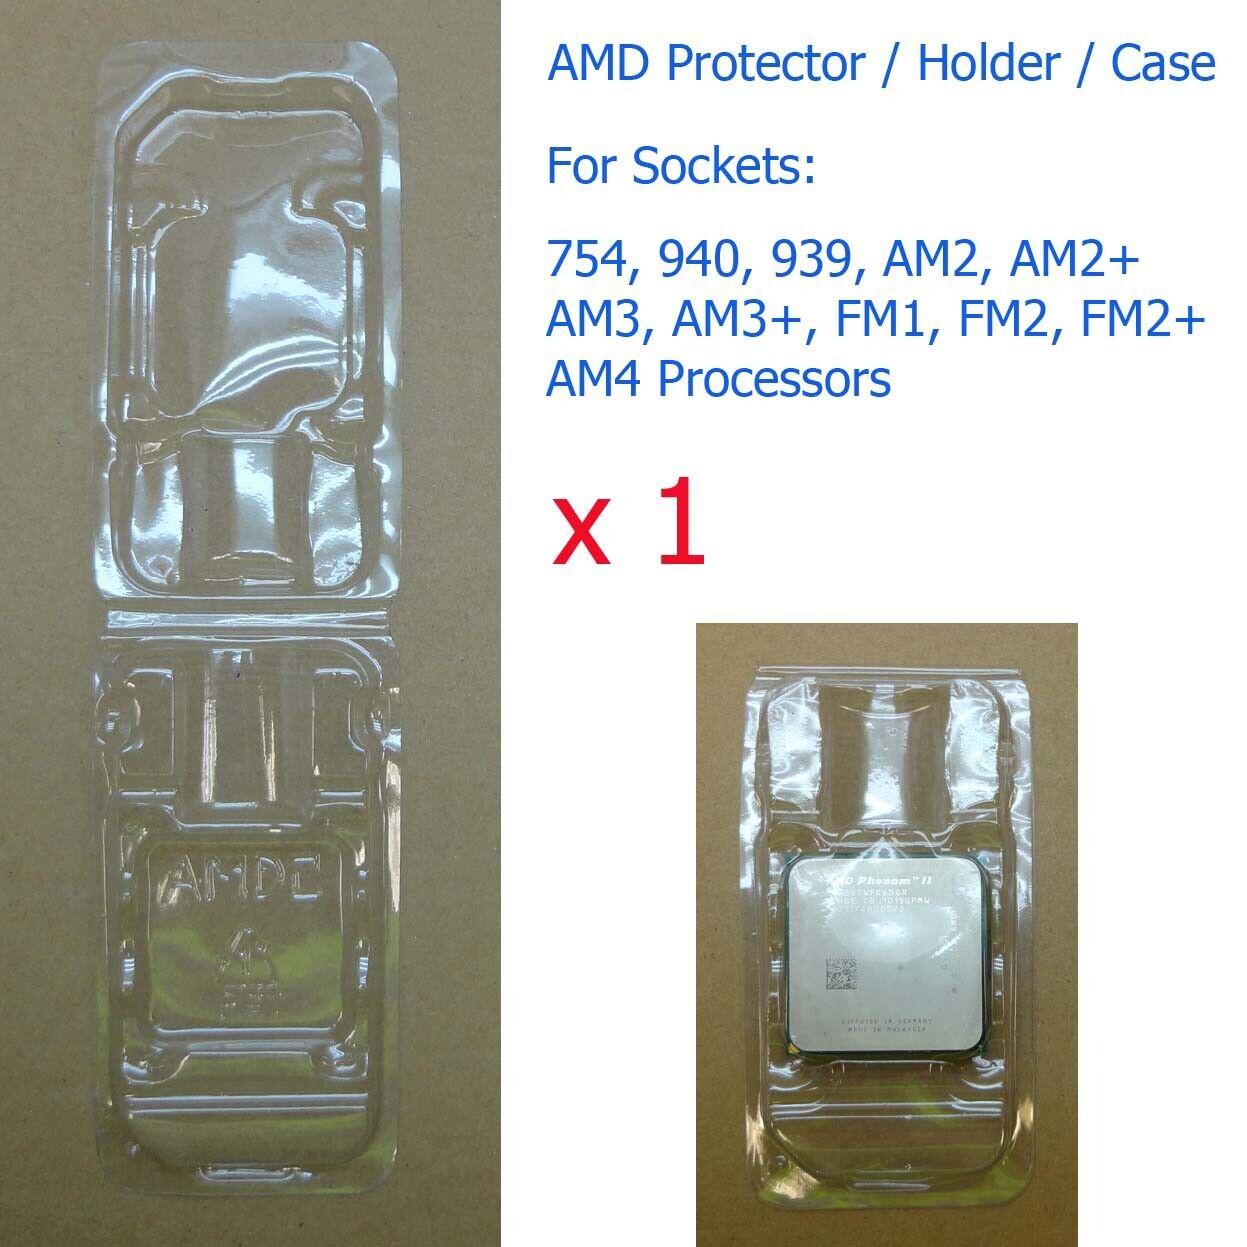 1 x Socket 754 940 939 AM2 AM3 FM1 FM2 AM4 Processor CPU Cover Holder Protector